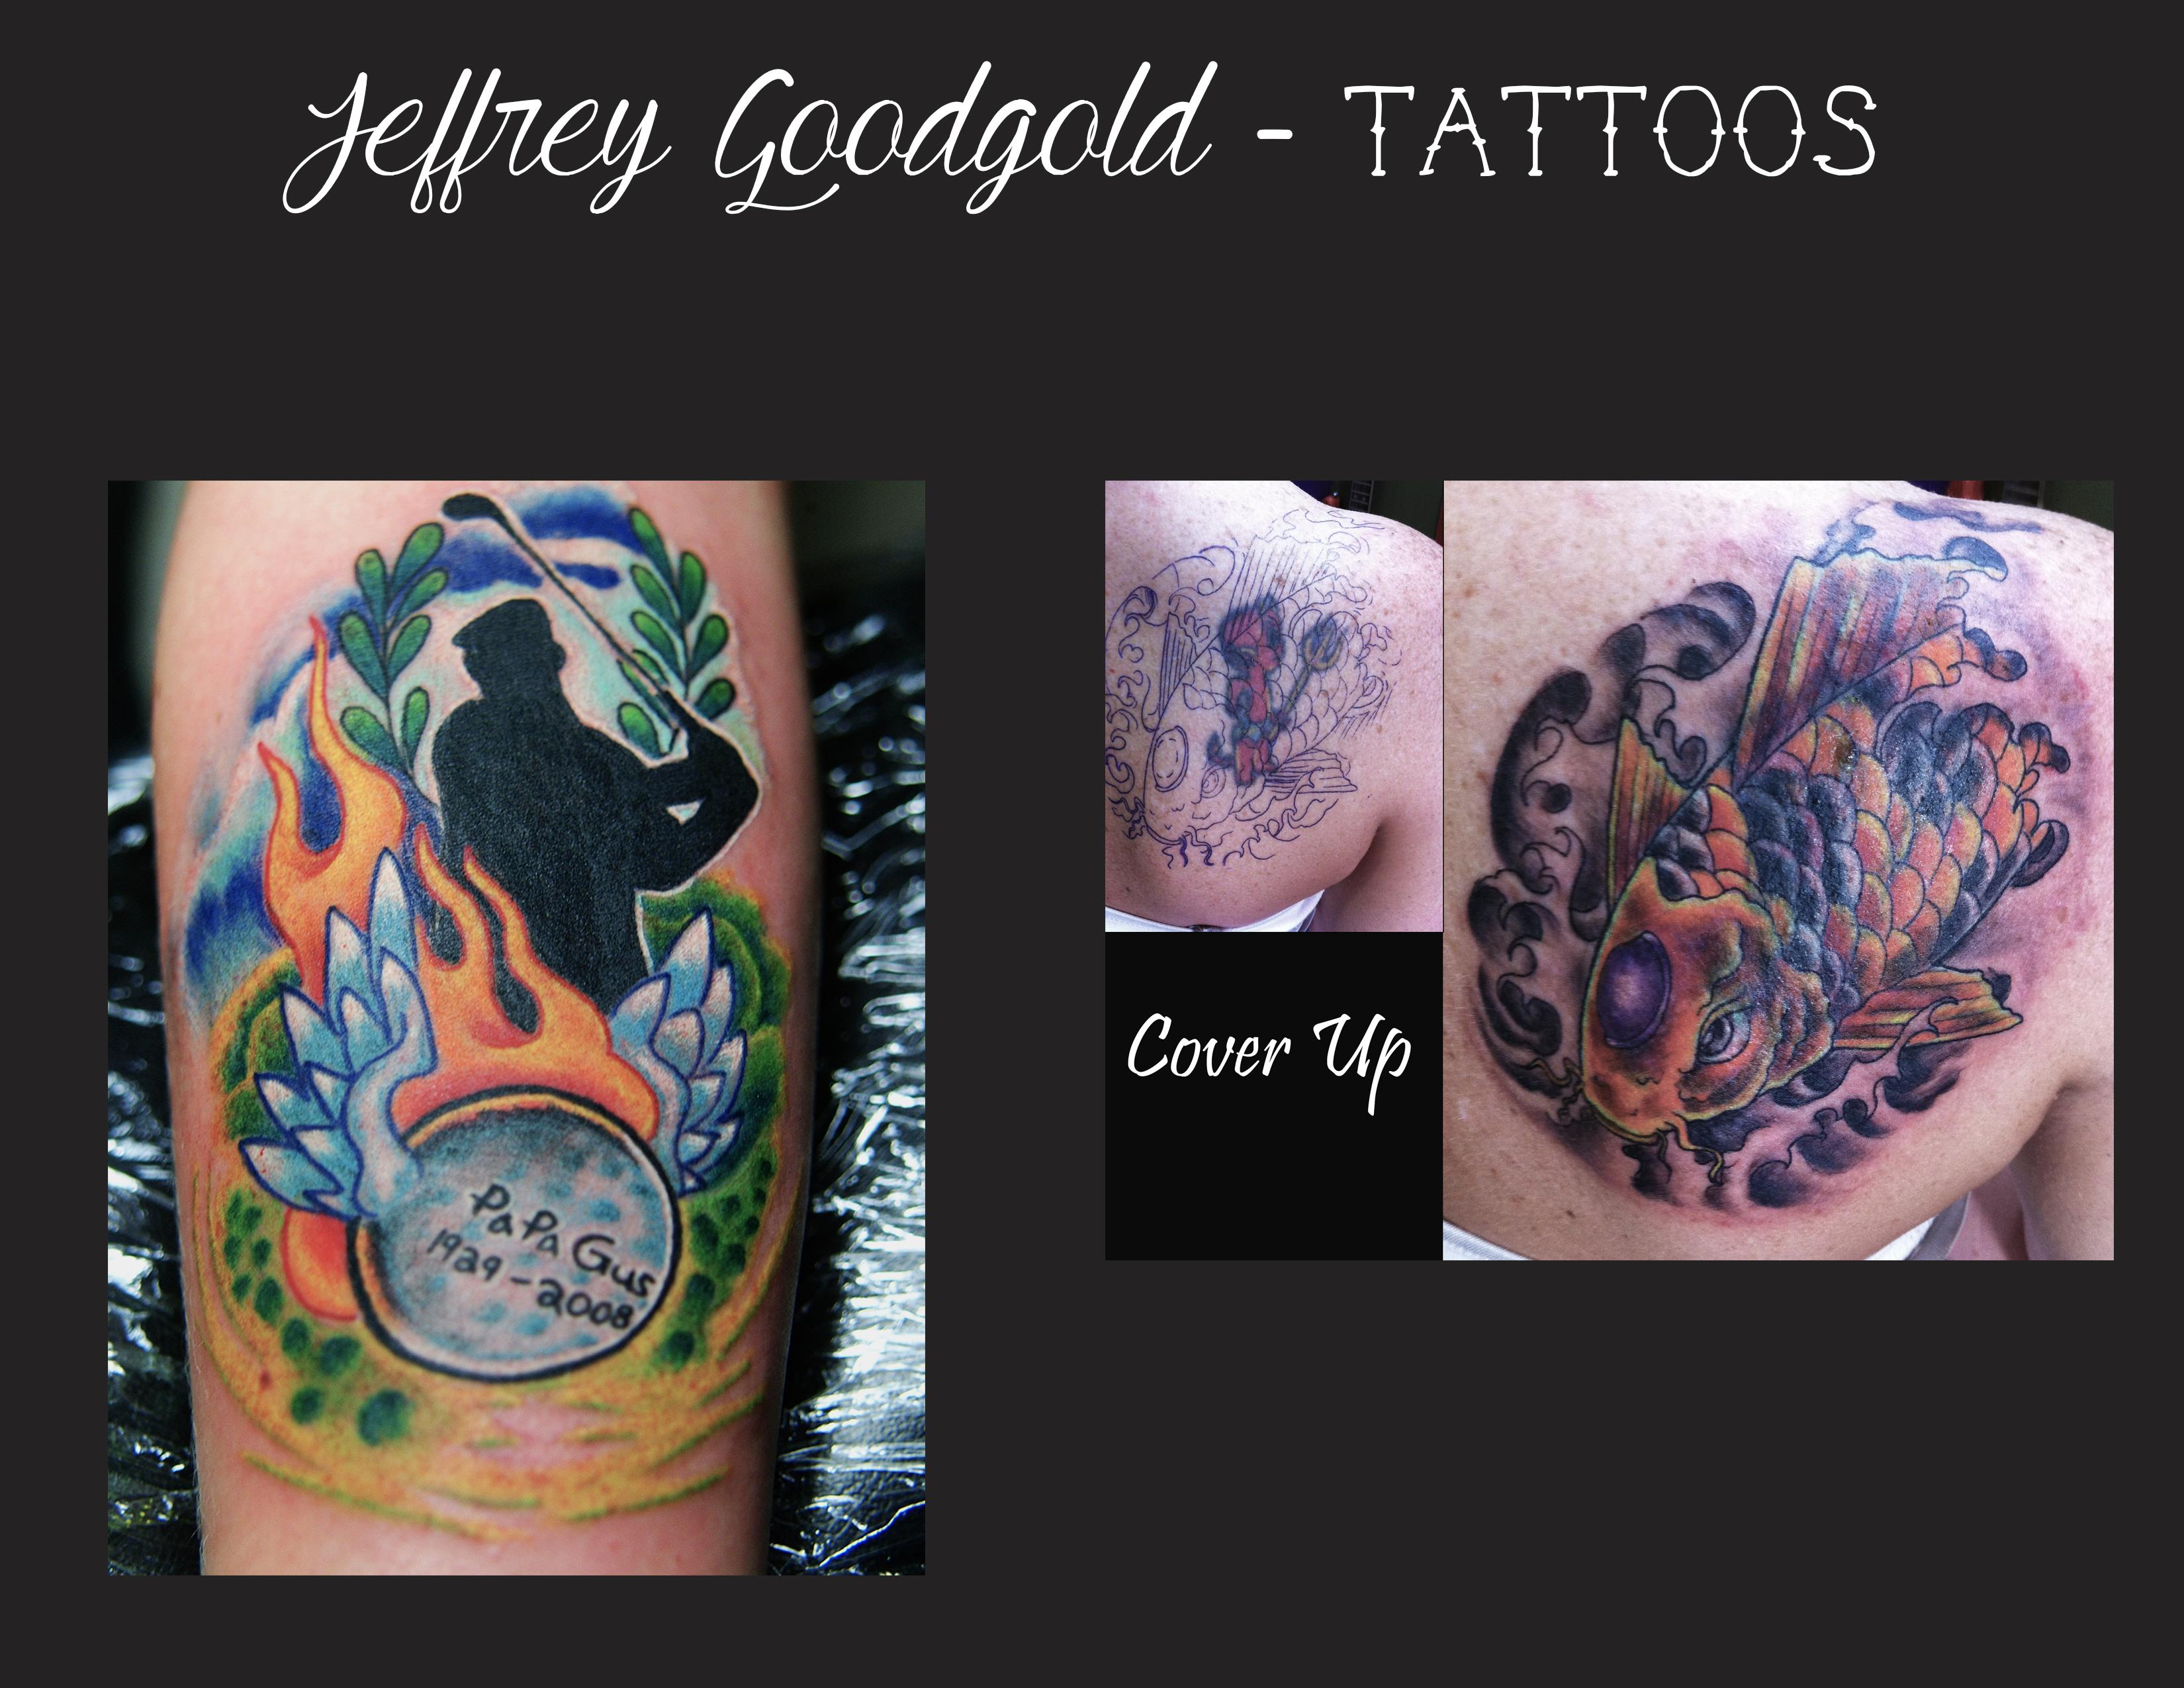 Golf & koi coverup tattoo